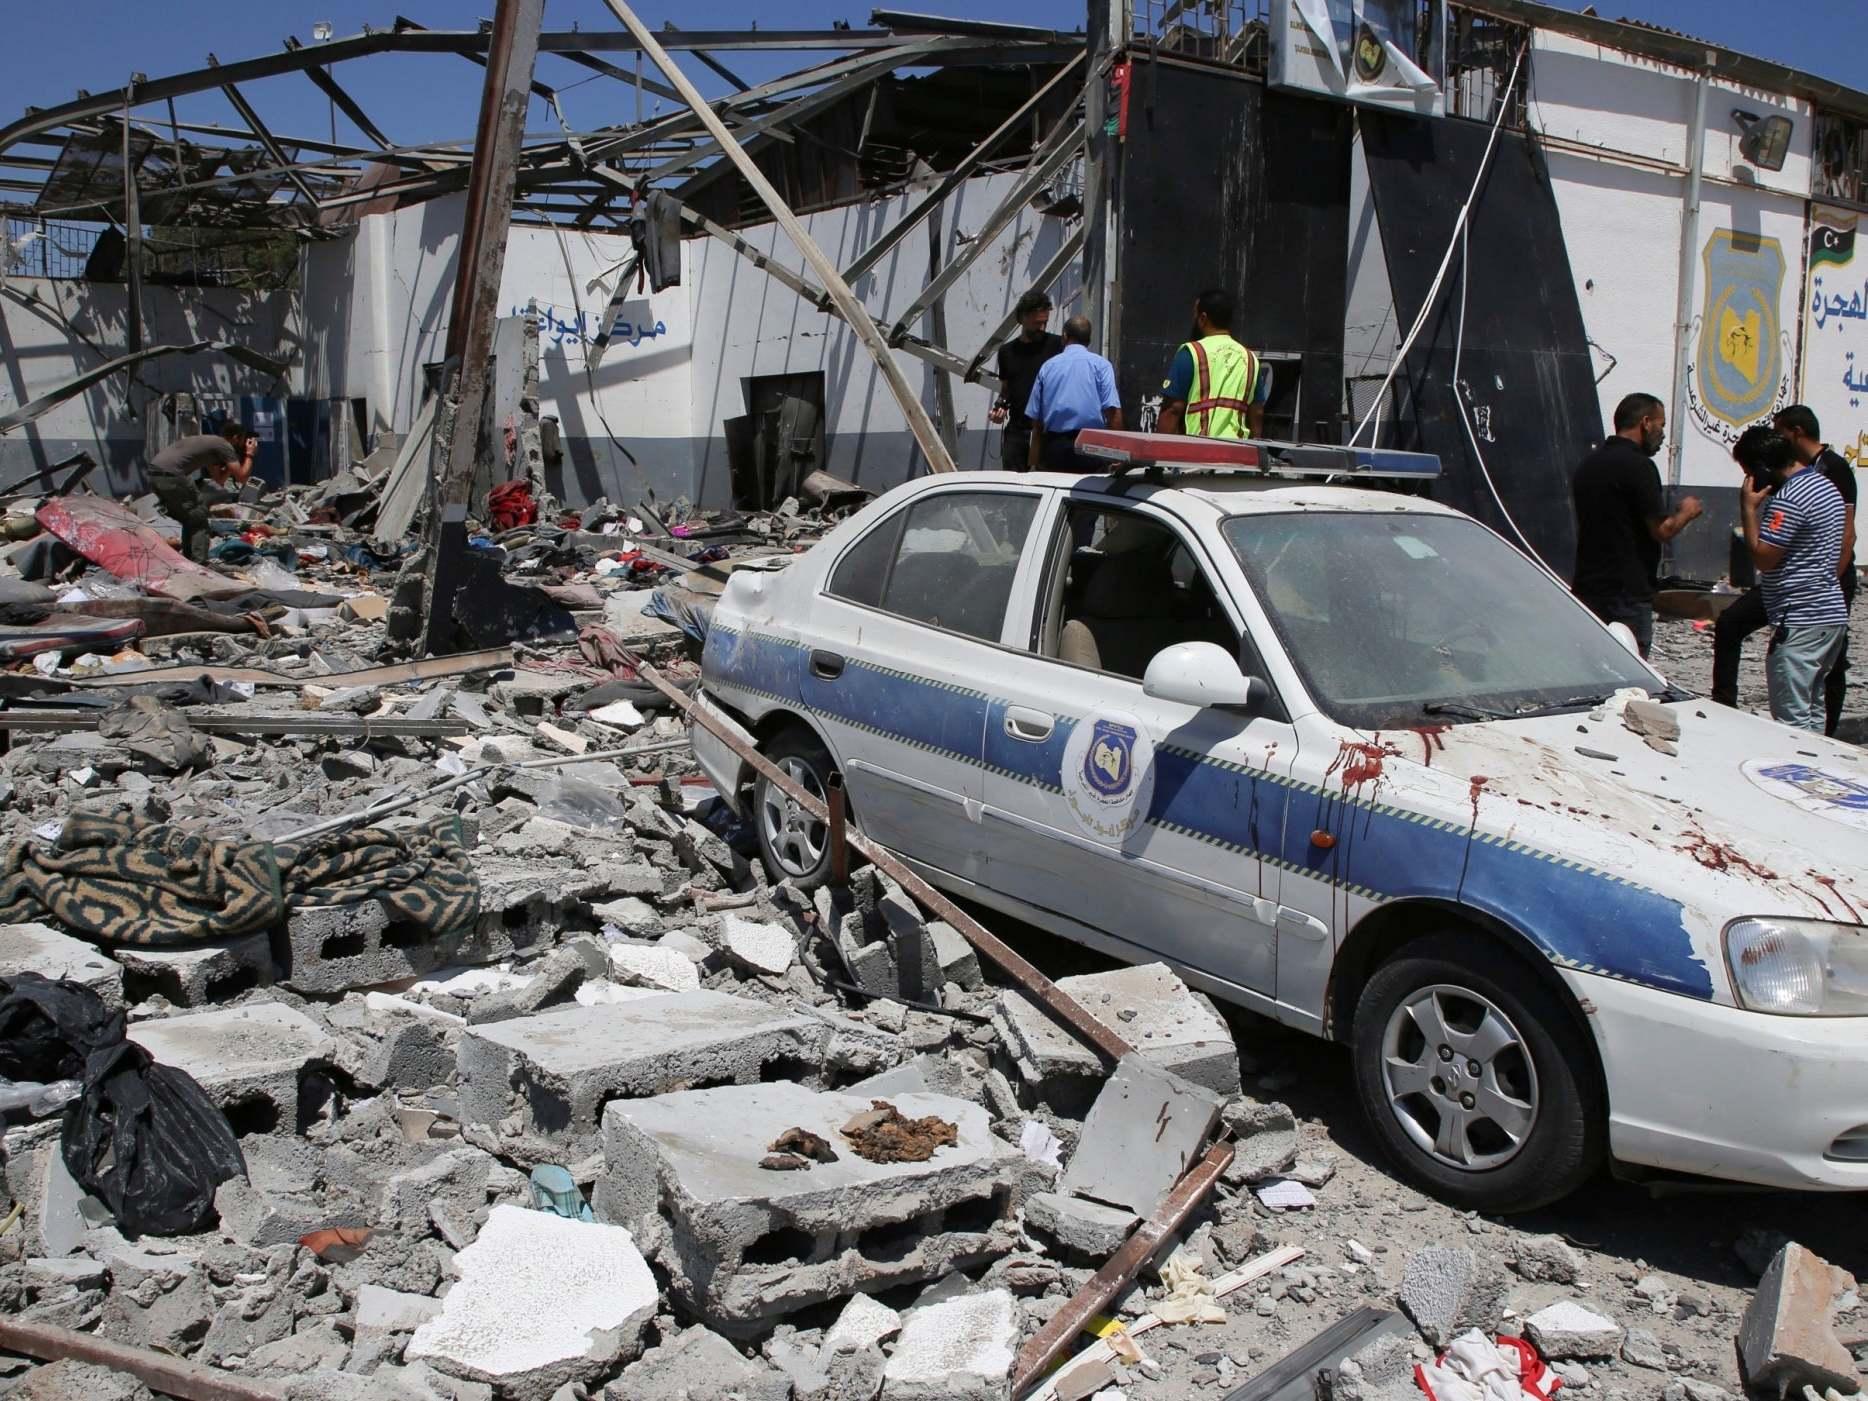 Libya heading towards 'full-blown' war despite ceasefire - independent